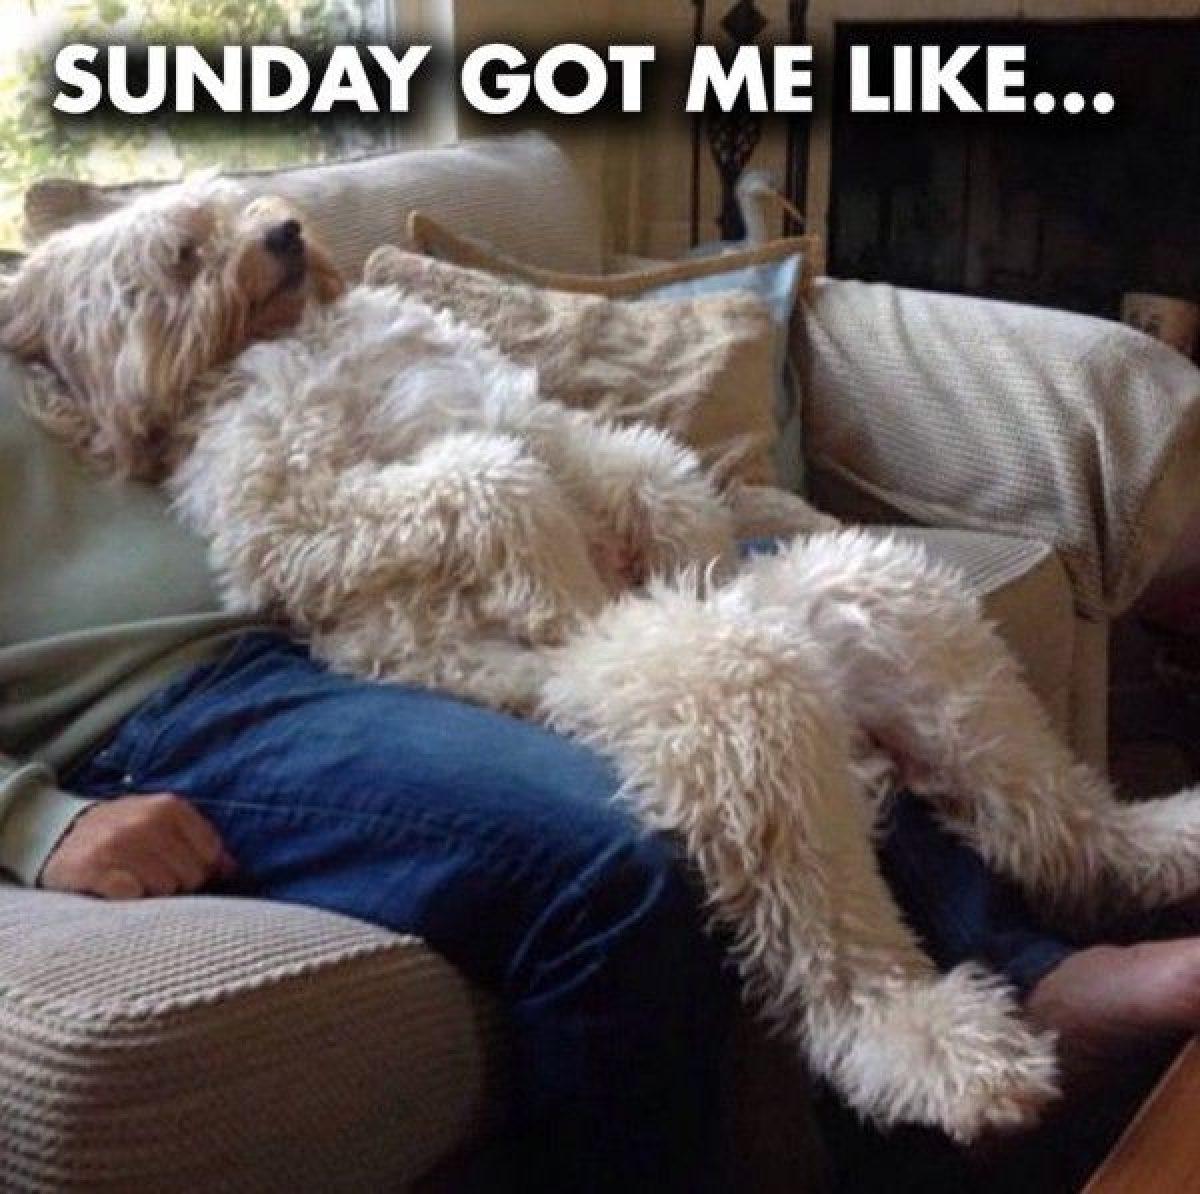 Sunday got me like